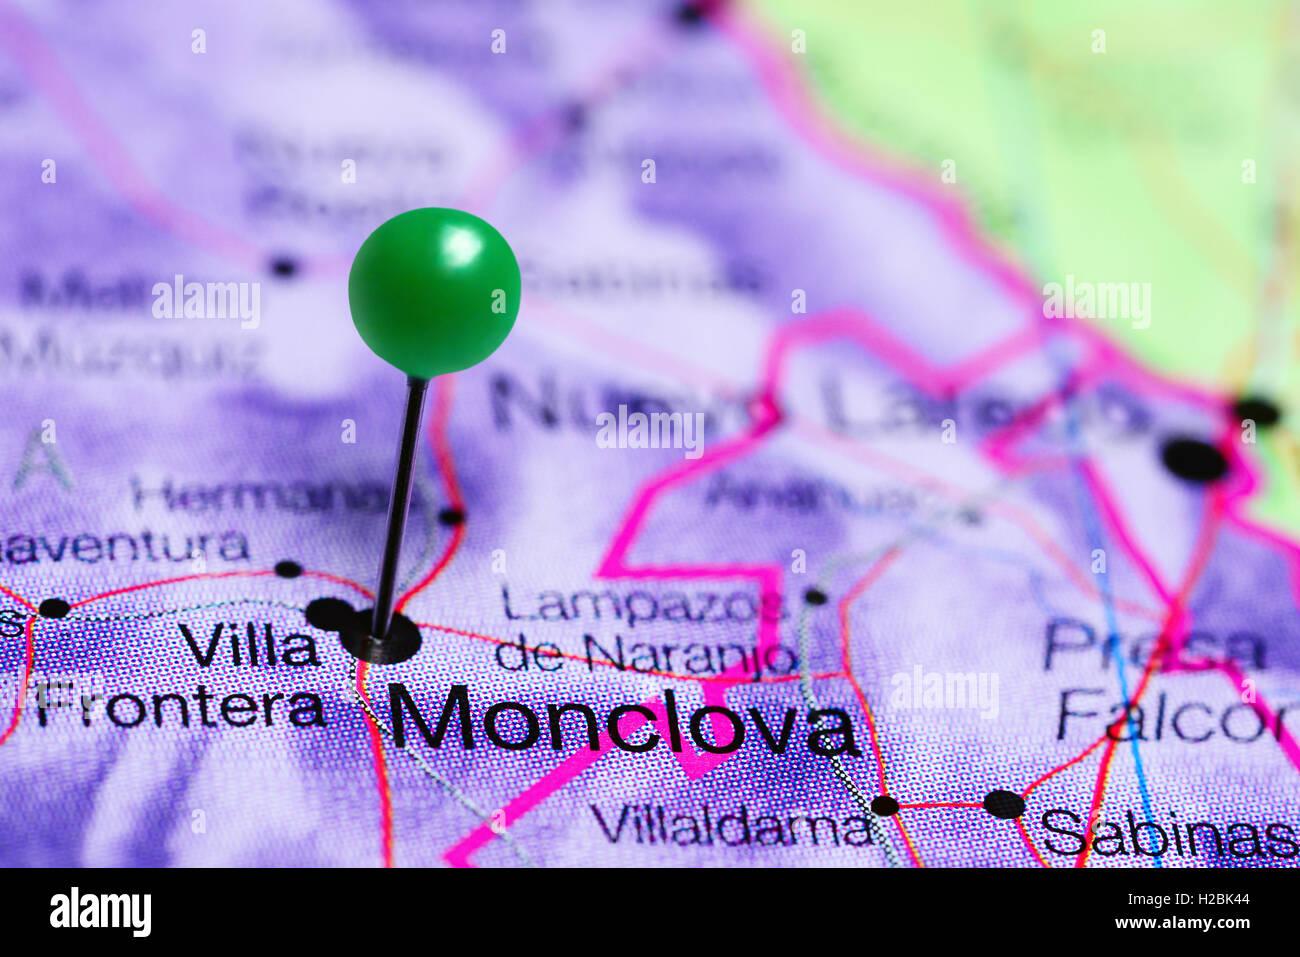 Monclova Mexico Map.Monclova Pinned On A Map Of Mexico Stock Photo 121958372 Alamy